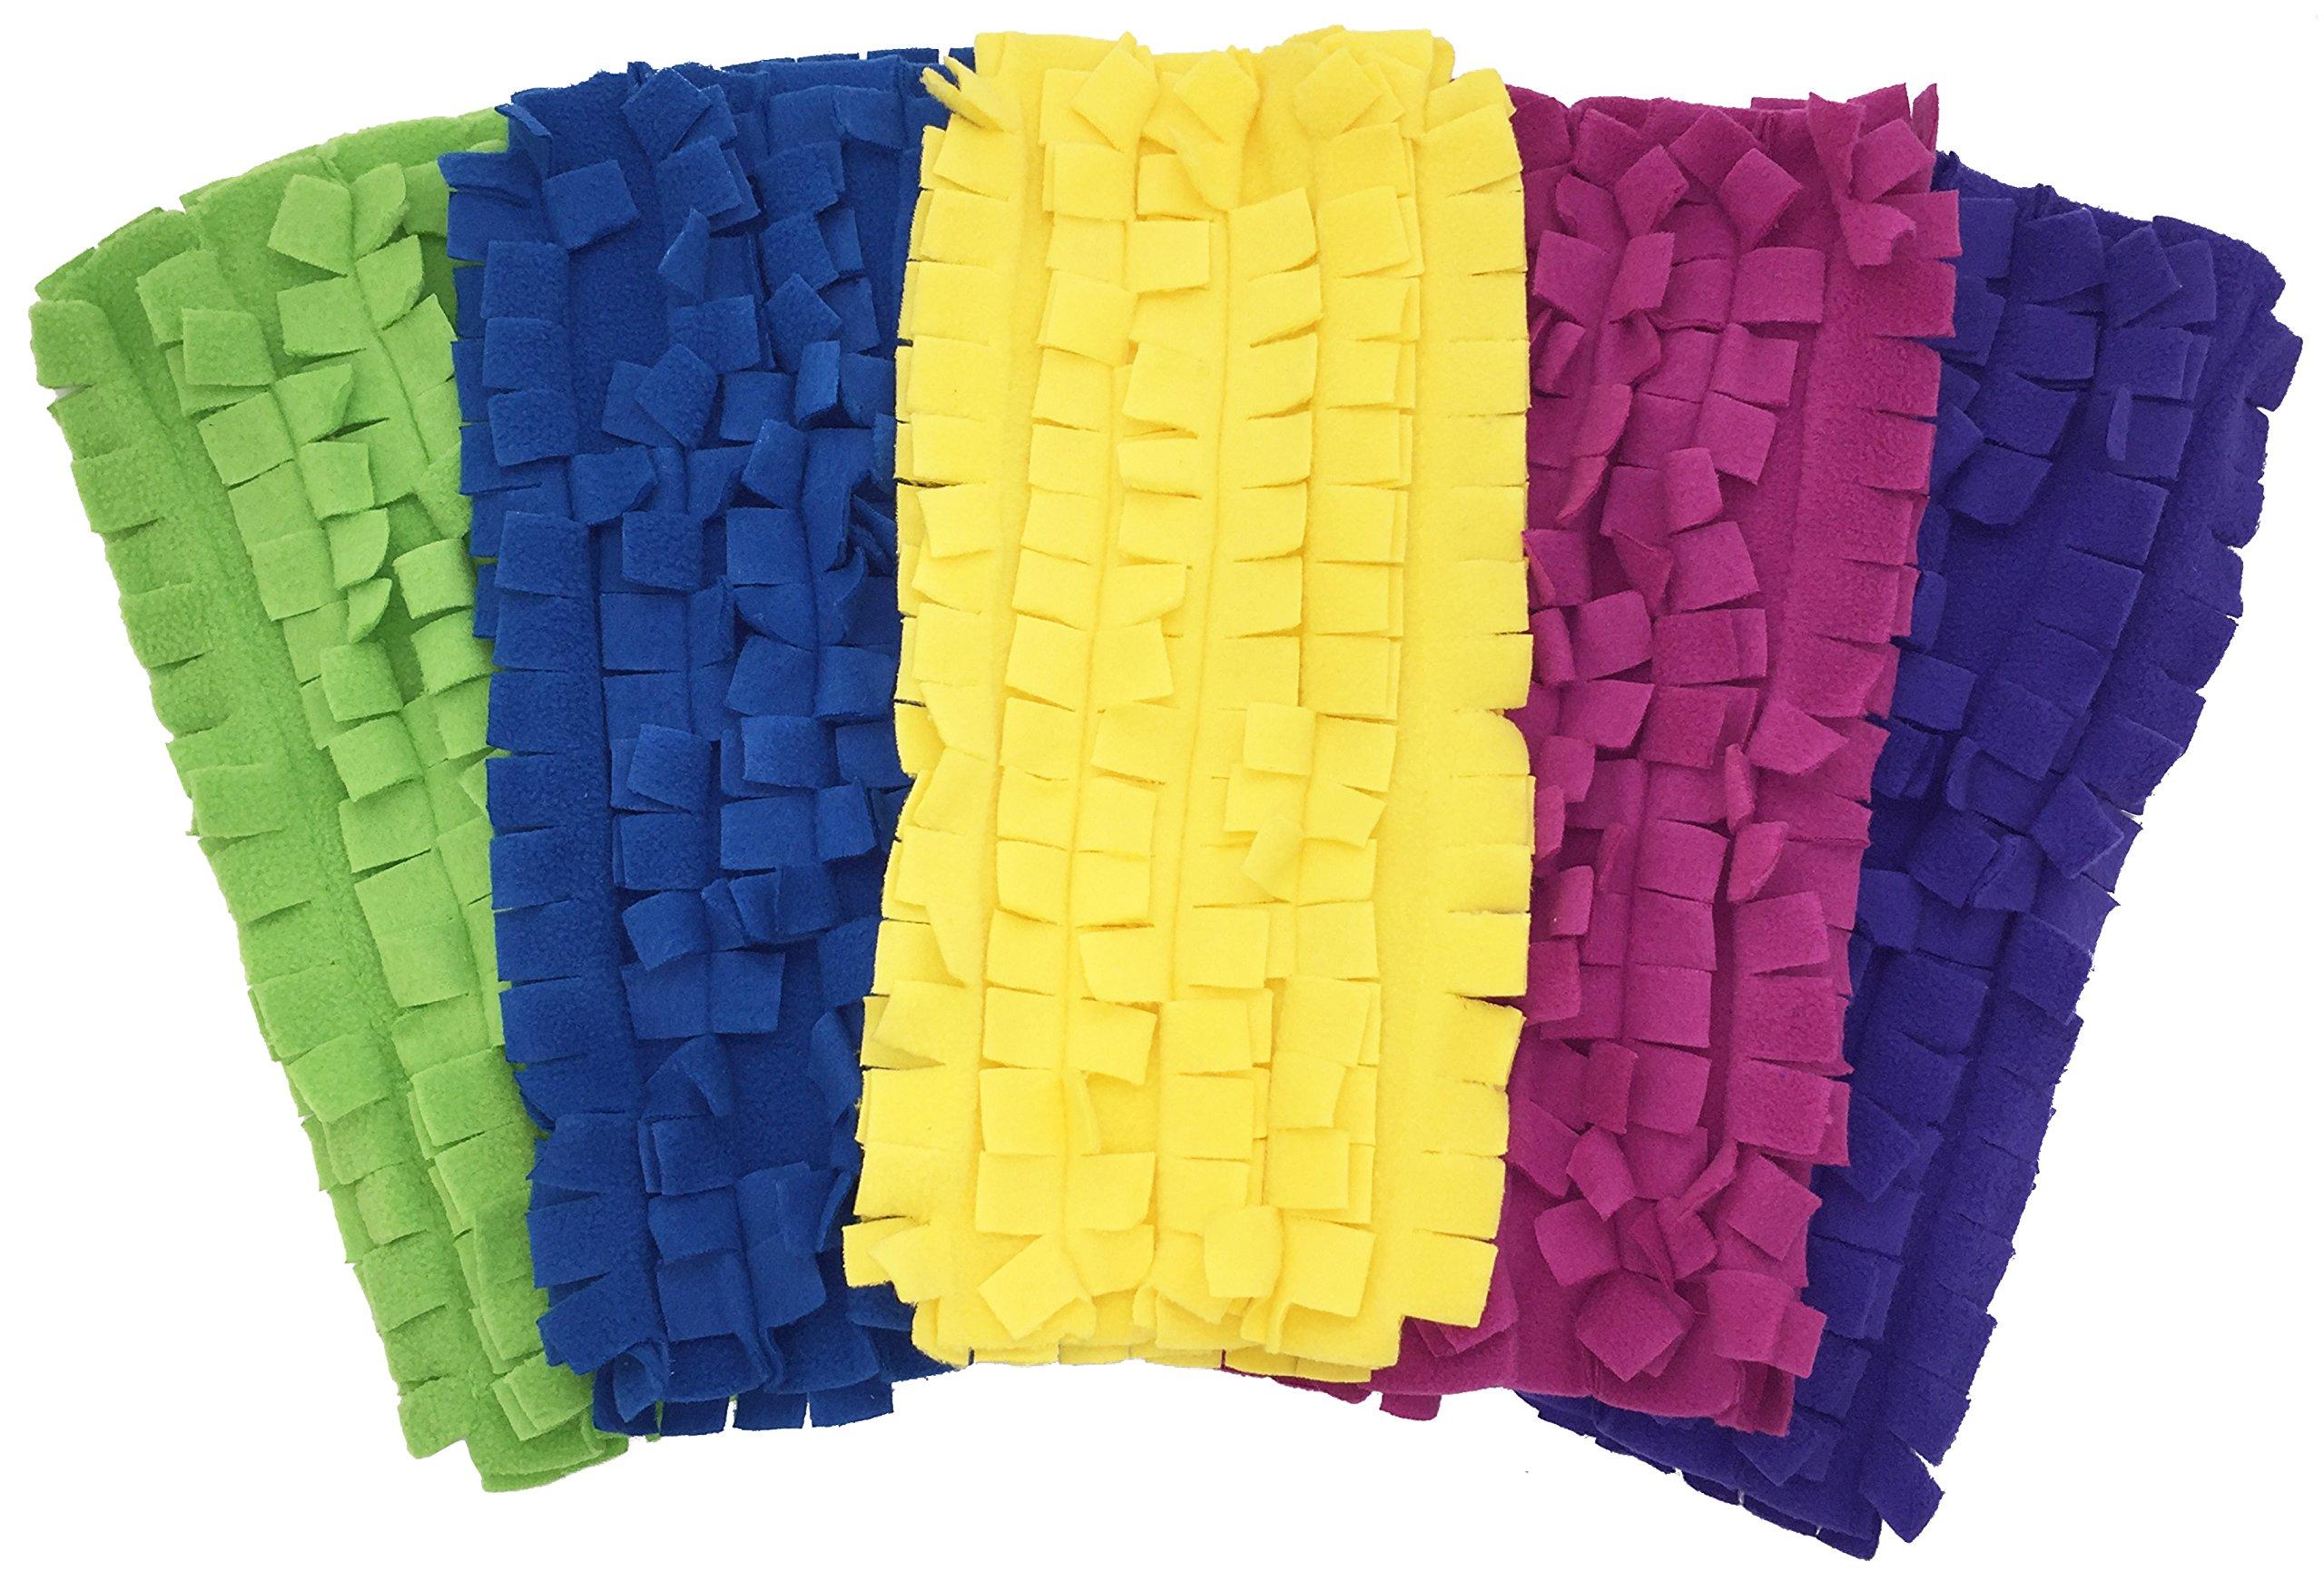 Xanitize Fleece Sweeper Mop Refills for Swiffer - Reusable, Dry Duster, for Hardwoods, Laminates - 5-pack Rainbow II